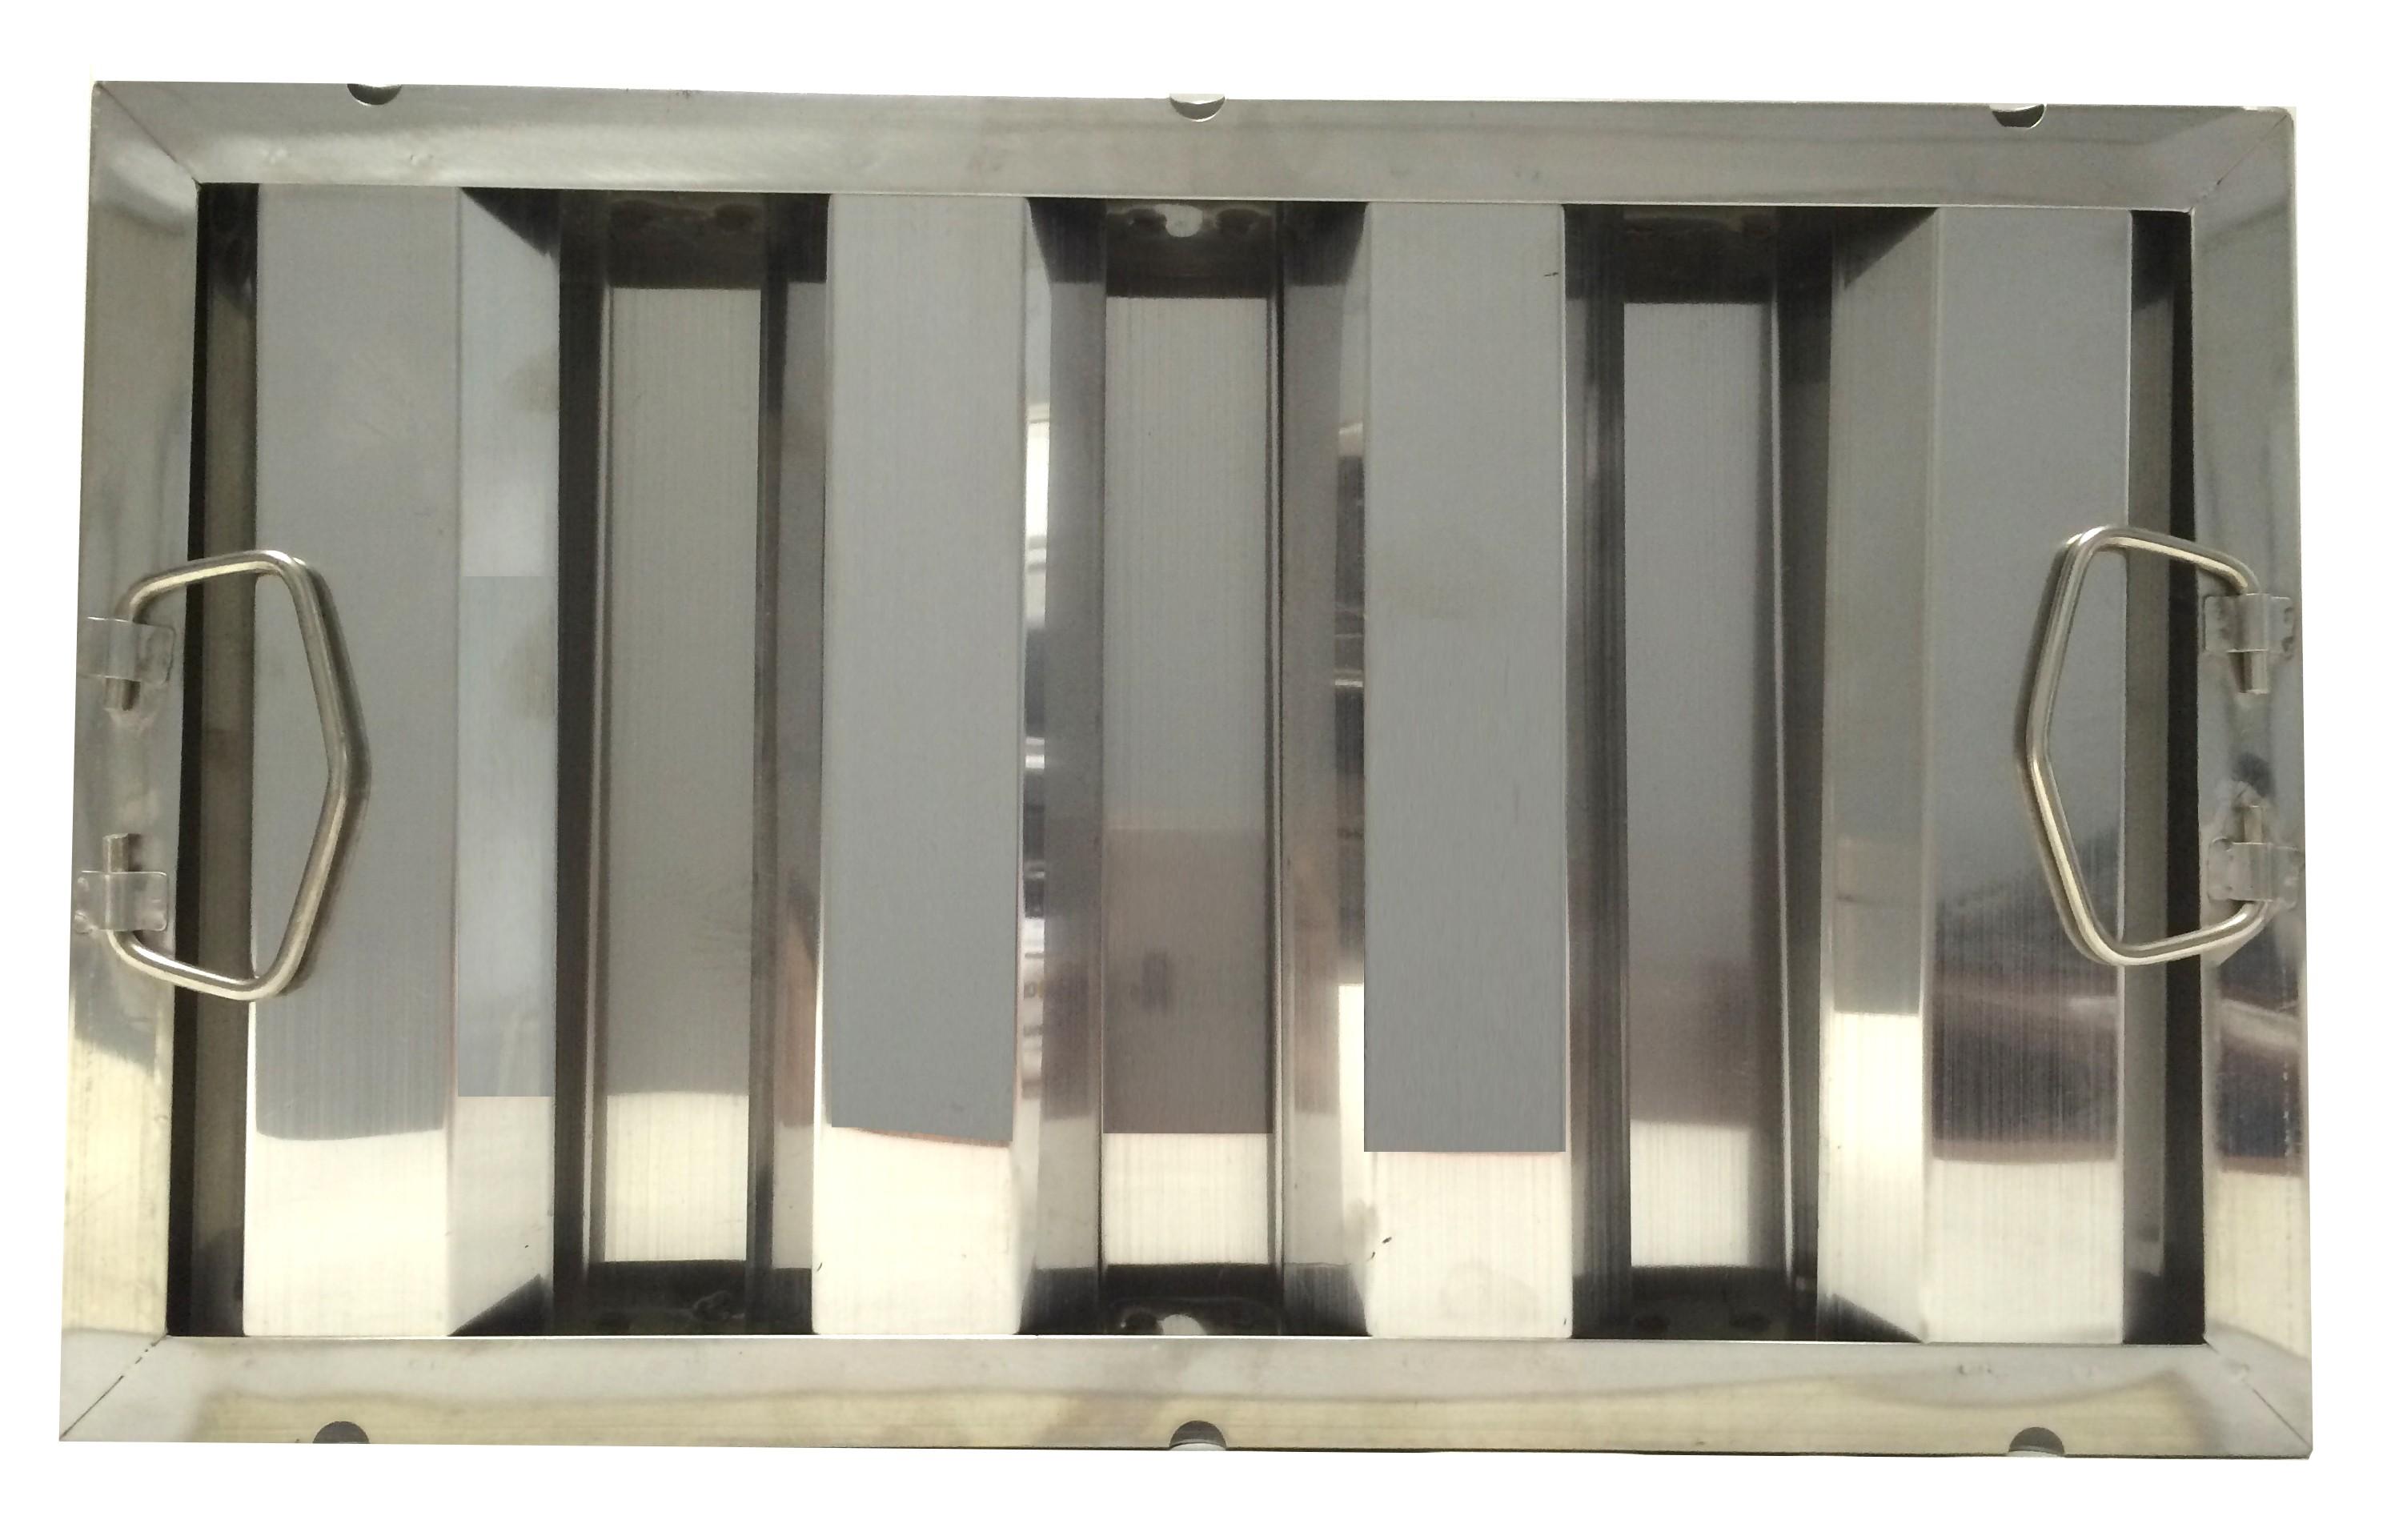 Hood Grease Filter X 16 X 15 Stainless Steel Hood